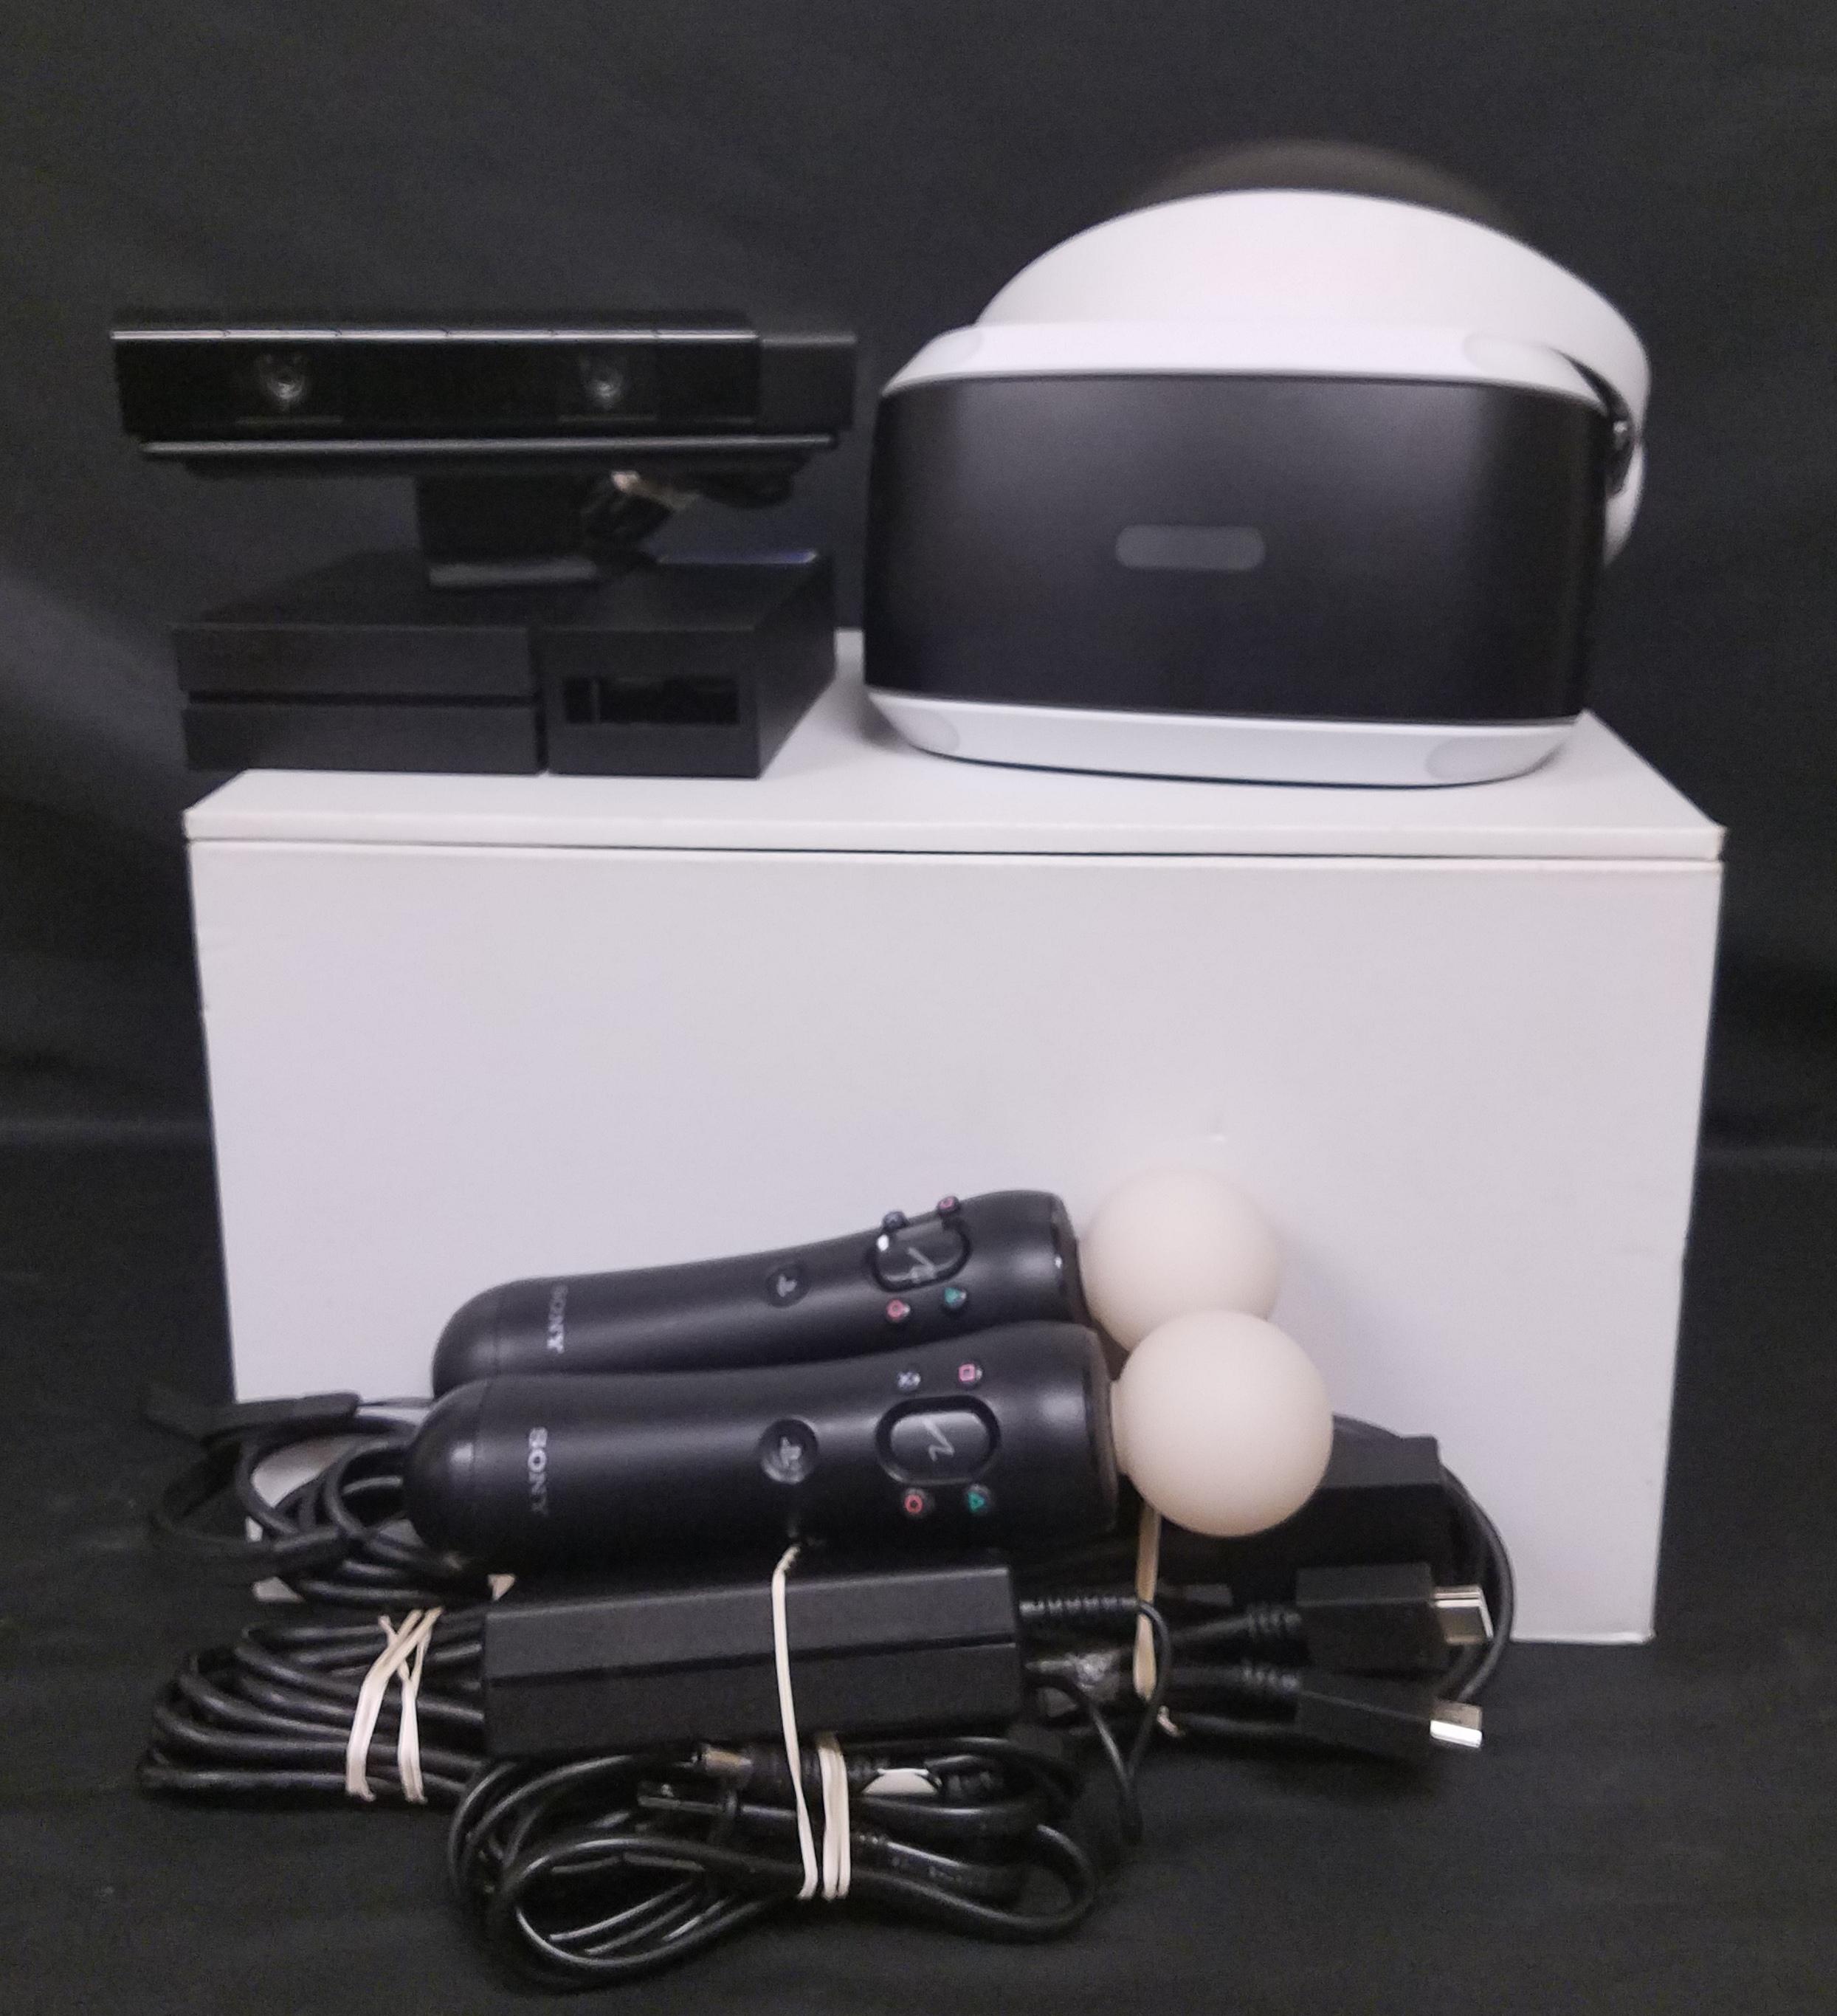 SONY VIRTUAL REALITY HEADSET - MODEL:  CUH-ZVR1